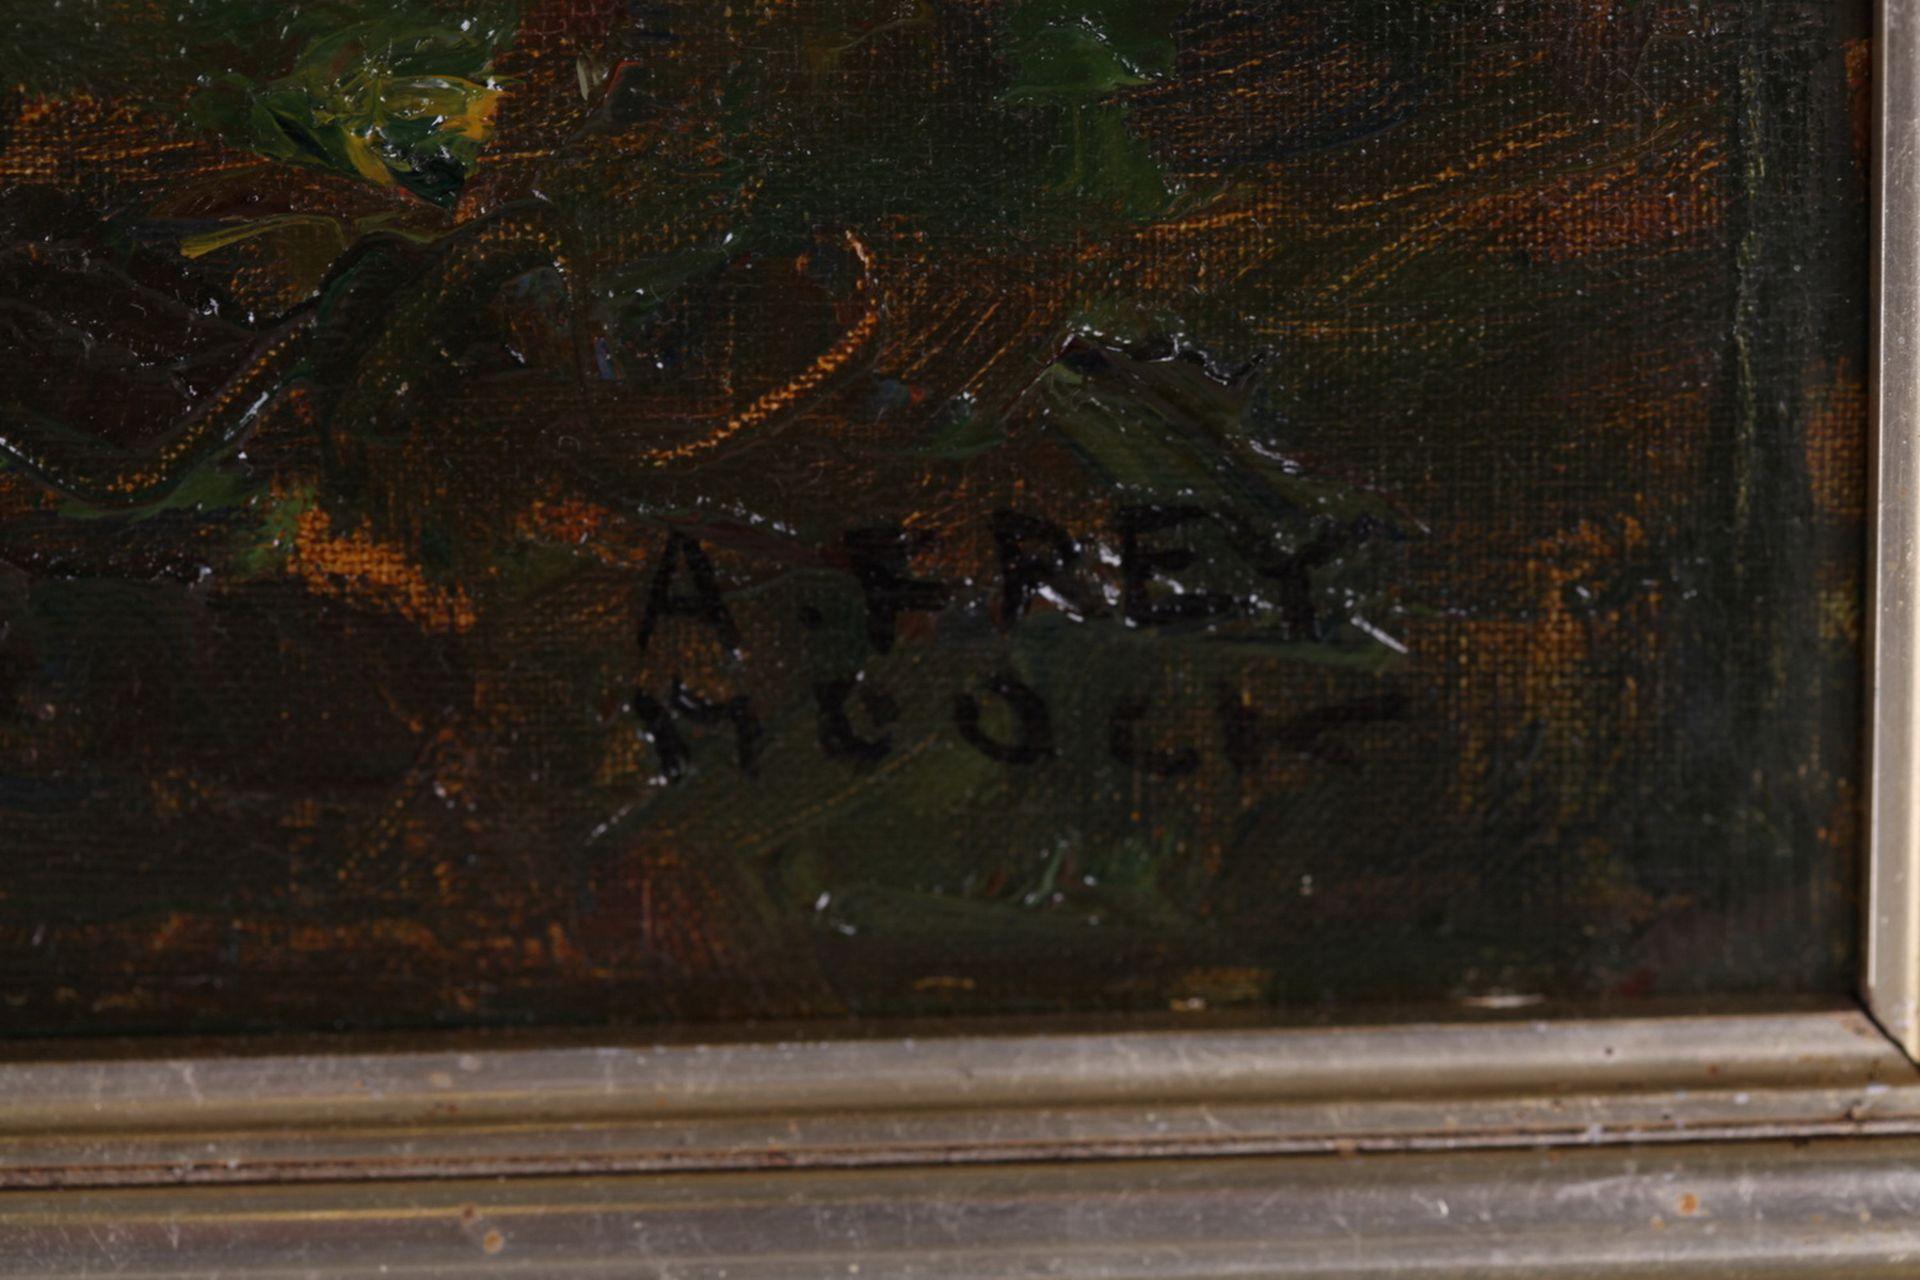 Frey-Moock, Adolf. Grapevine. [The first half of the ХХ century]. Oil on canvas. 50,5x60 cm.<br>Sign - Bild 4 aus 4